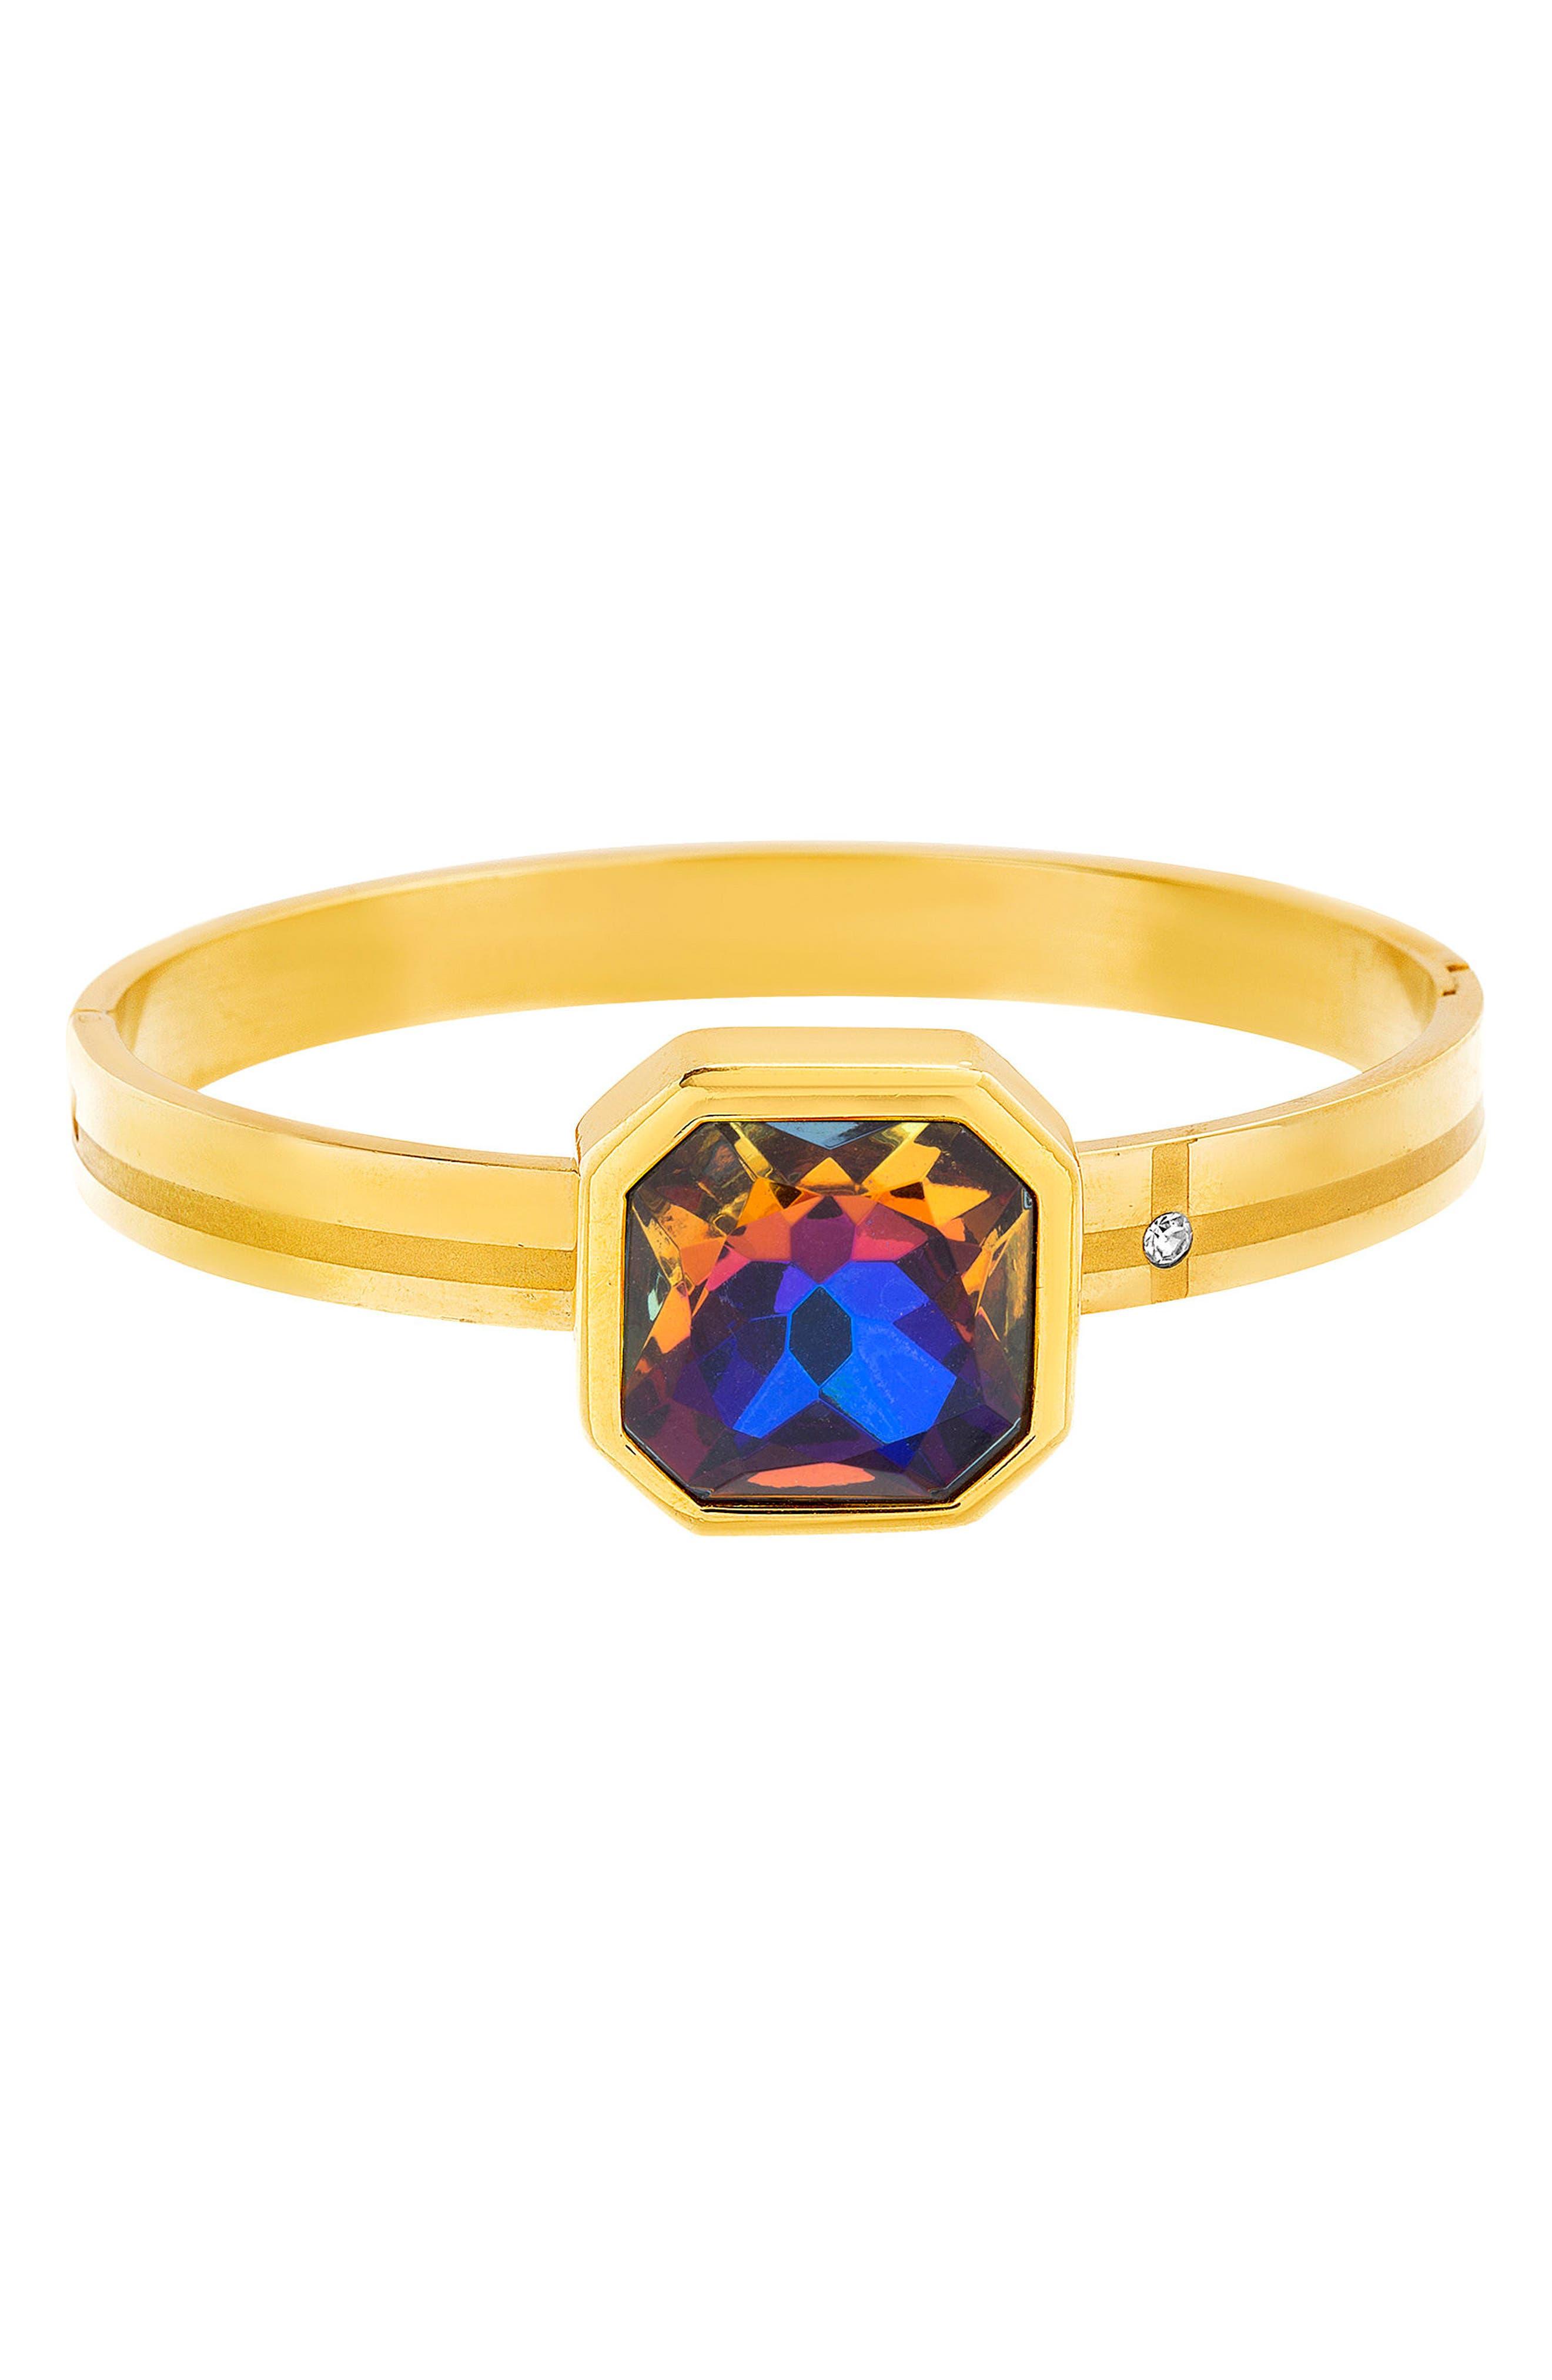 Main Image - Steve Madden Crystal Bracelet